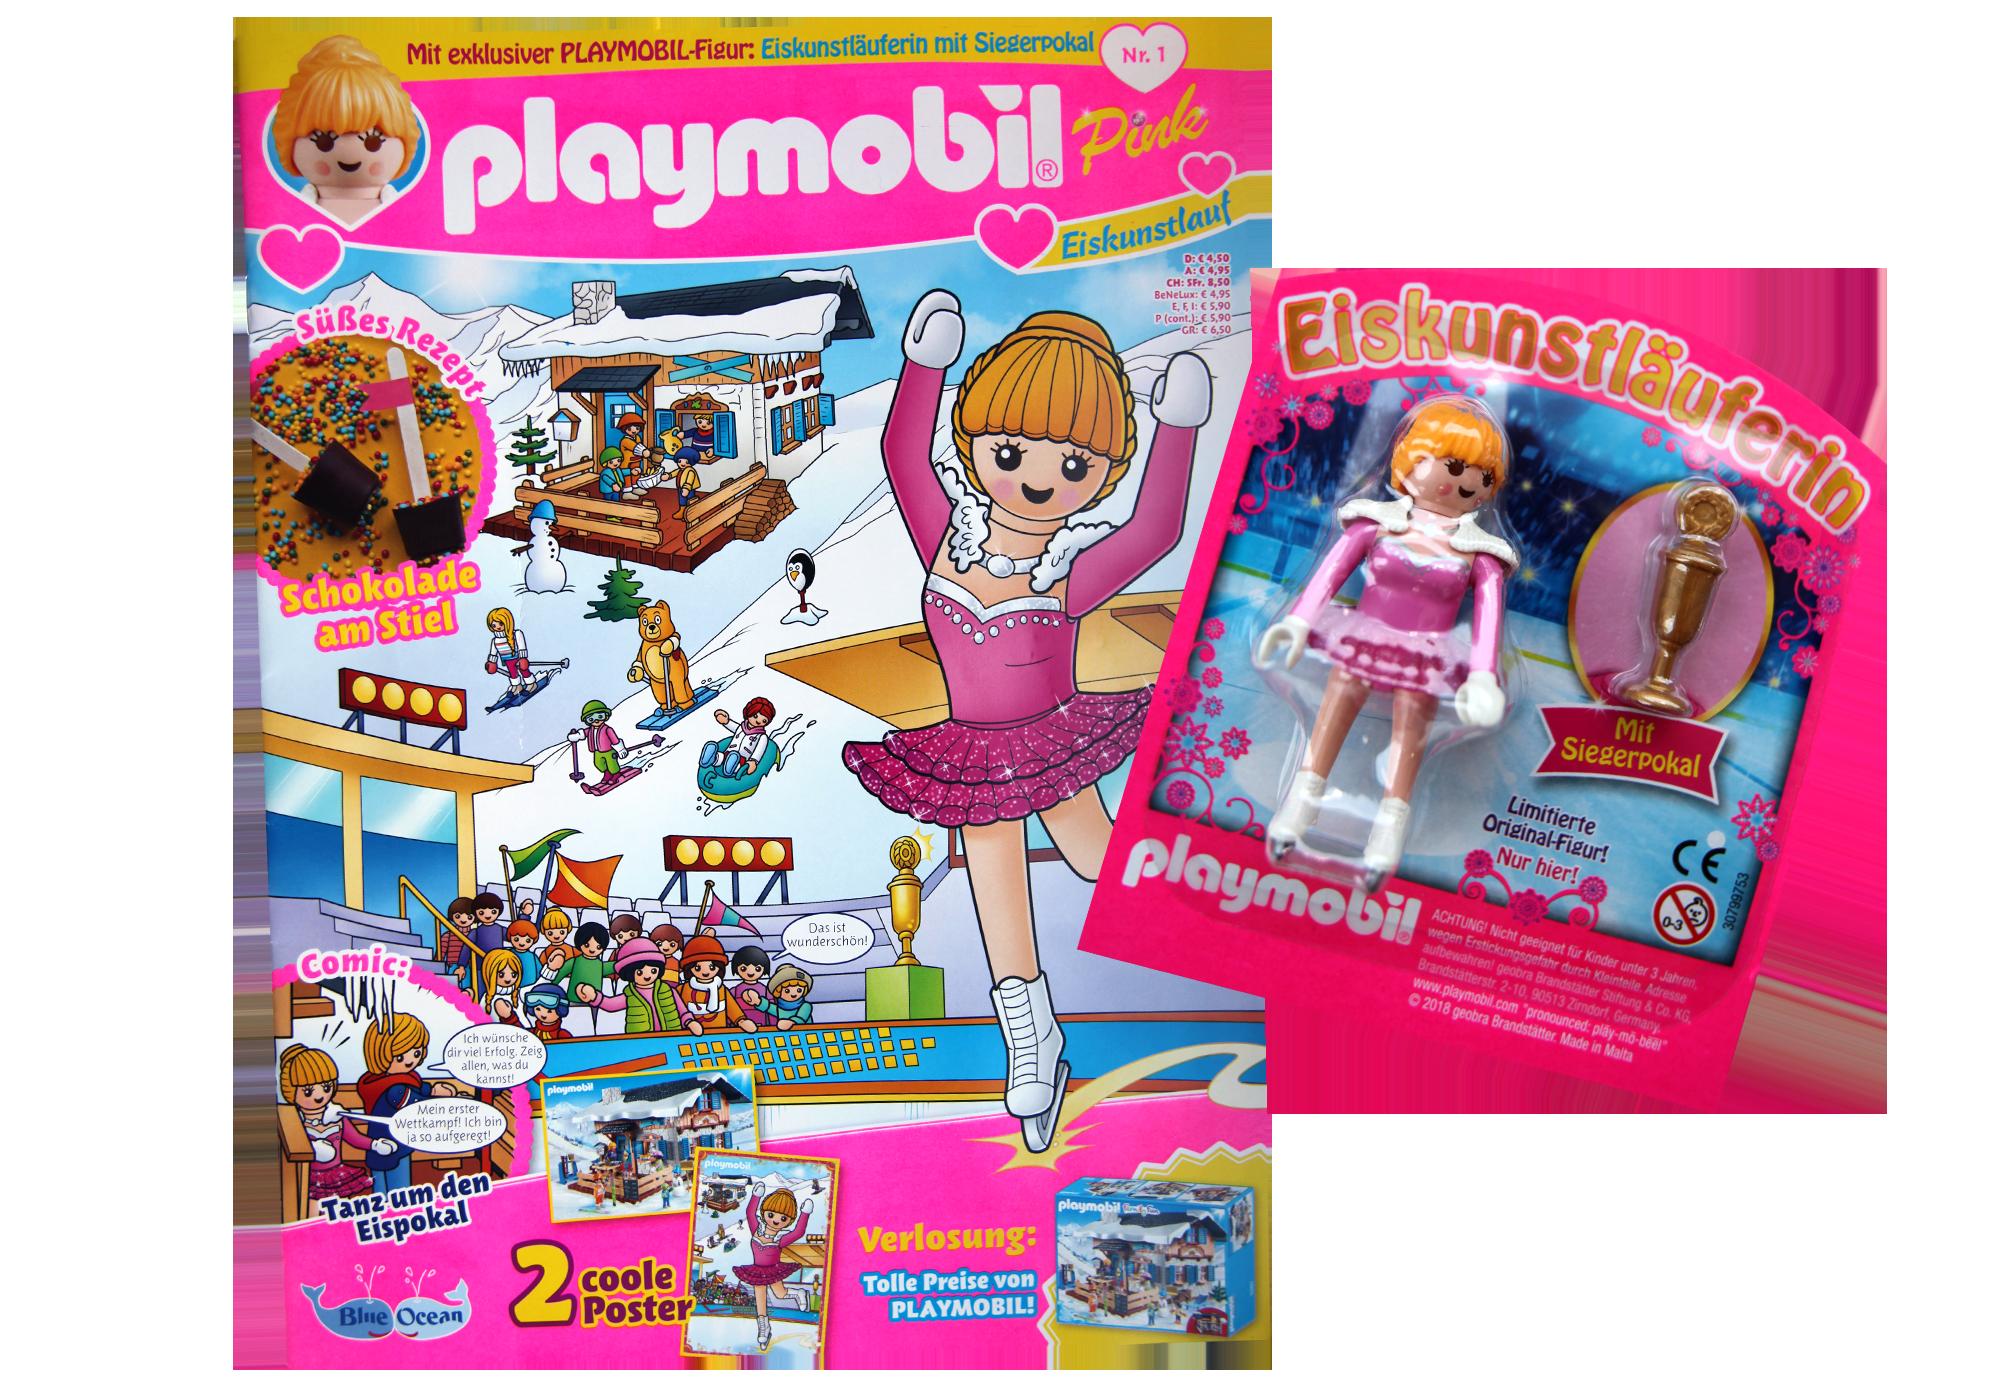 http://media.playmobil.com/i/playmobil/80601_product_detail